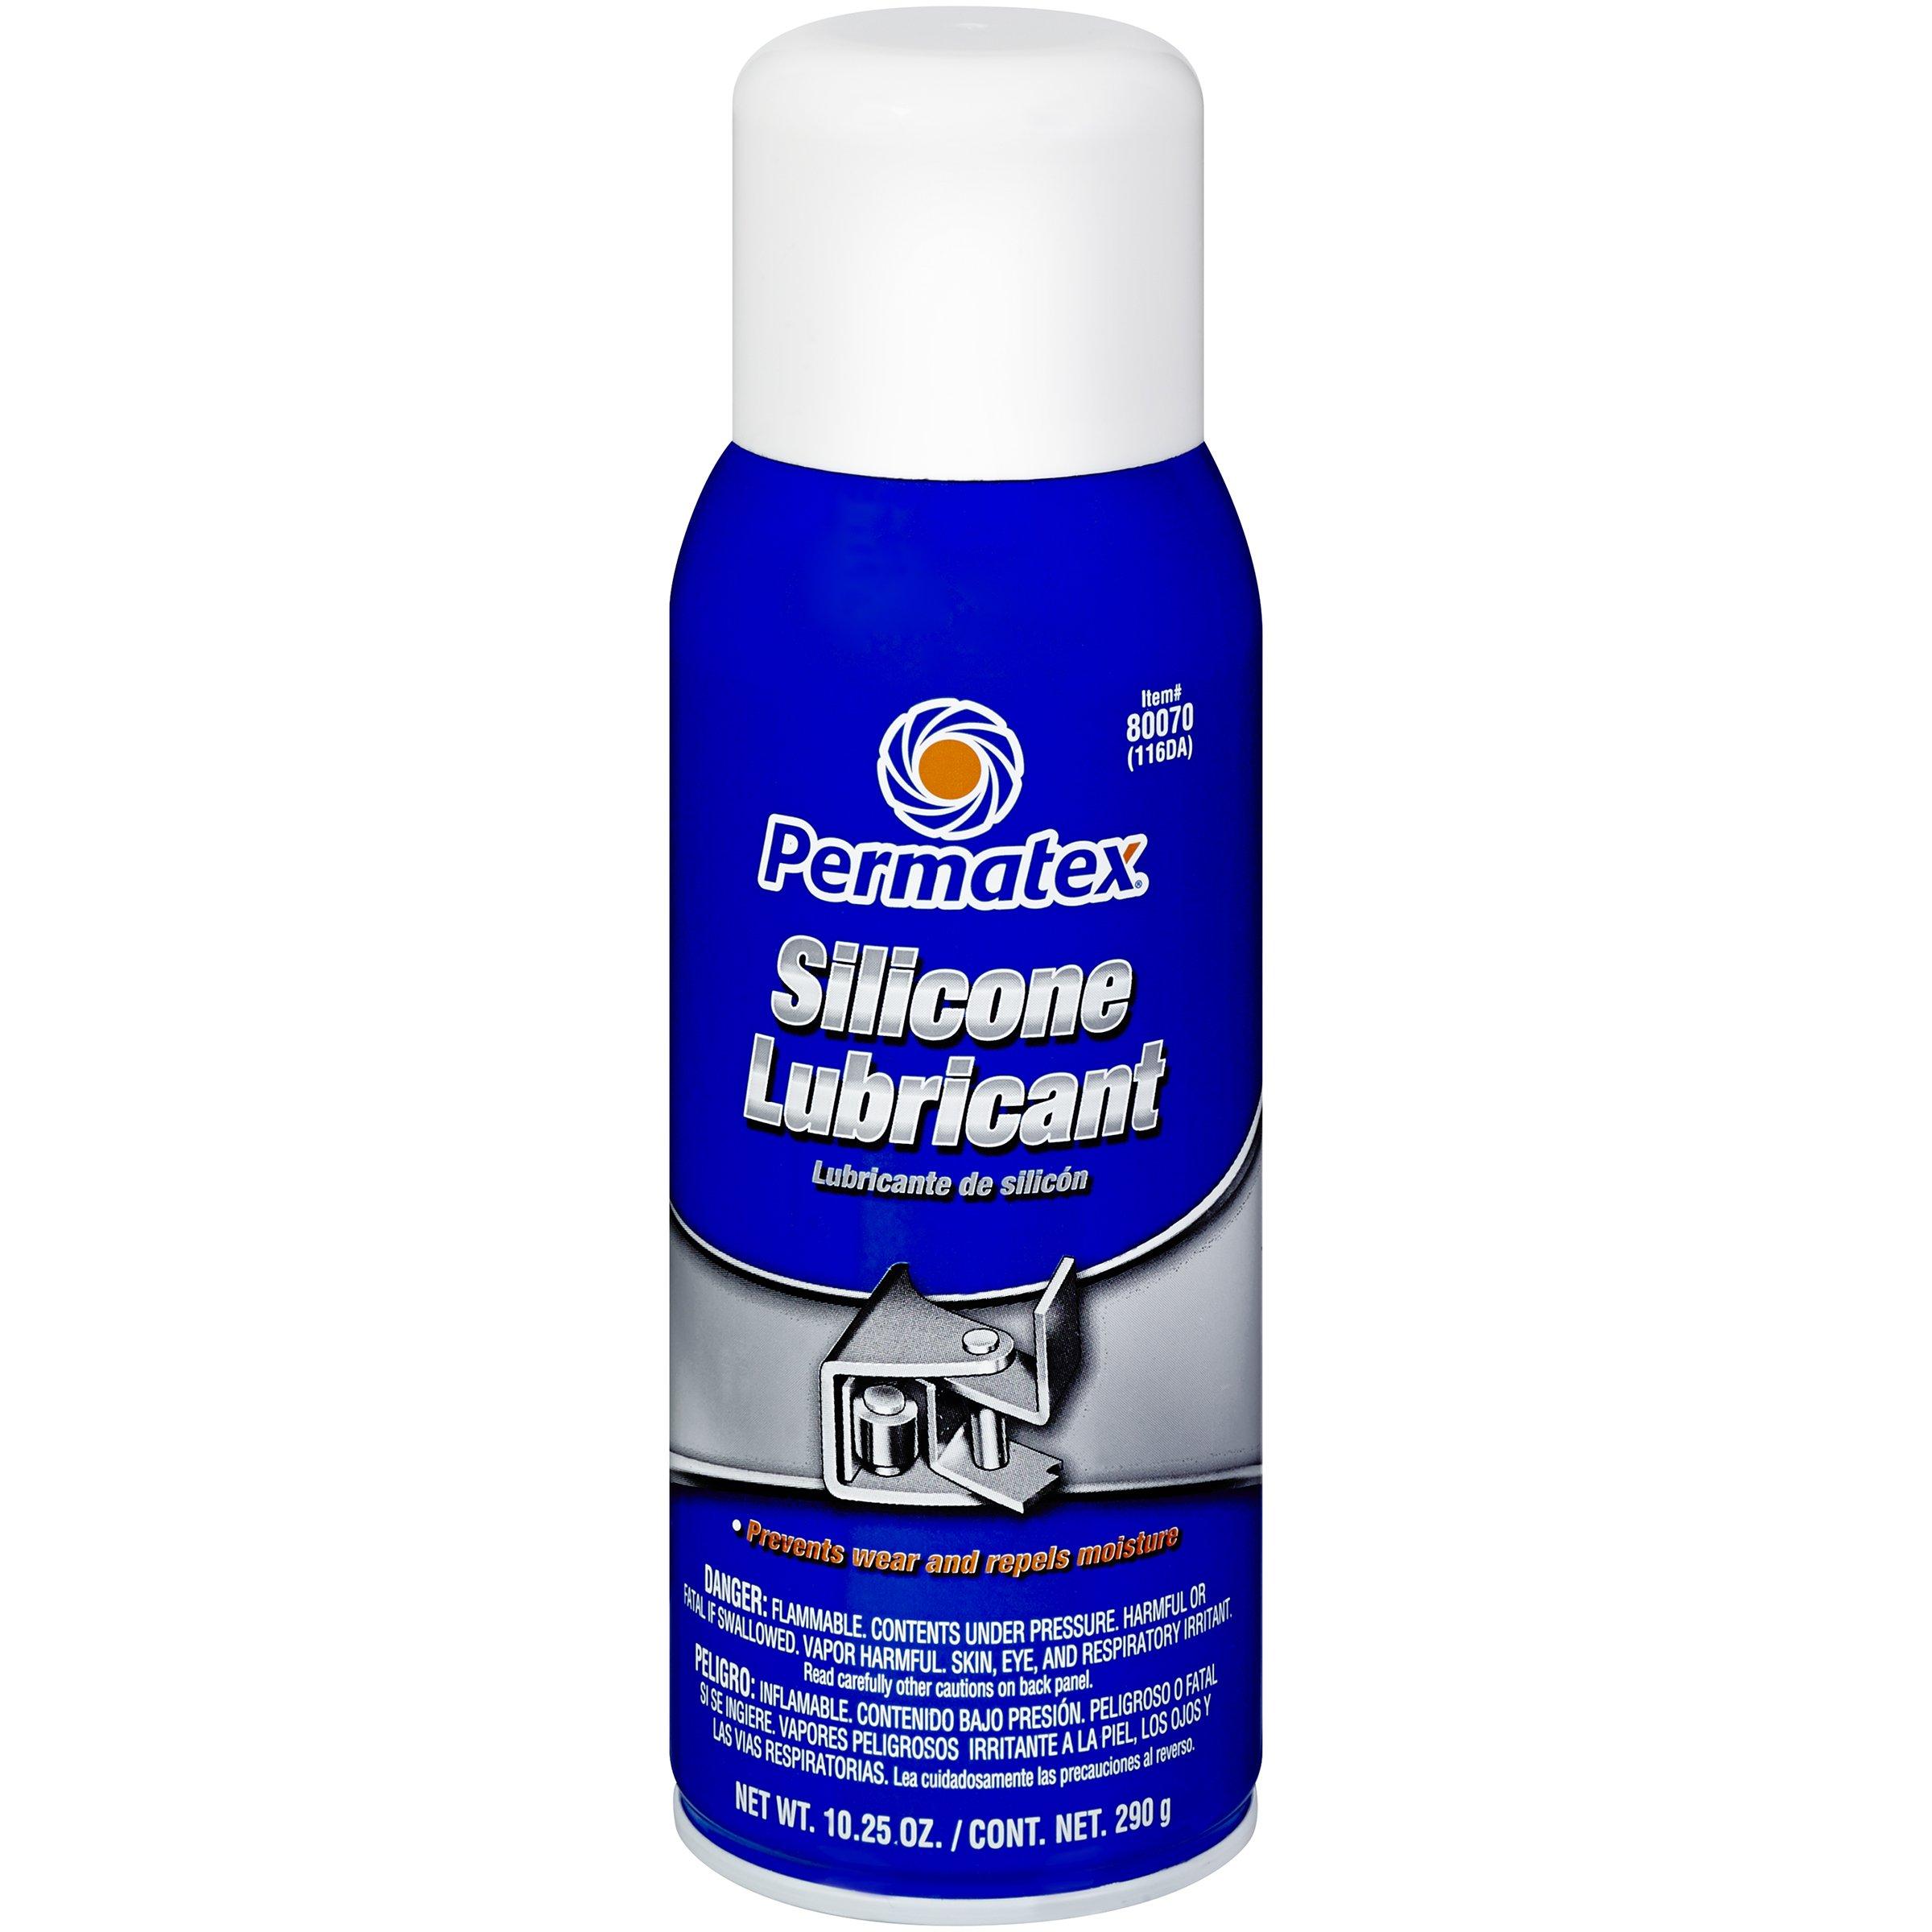 Permatex 80070-12PK Silicone Spray Lubricant, 10.25 oz. net Aerosol Can (Pack of 12) by Permatex